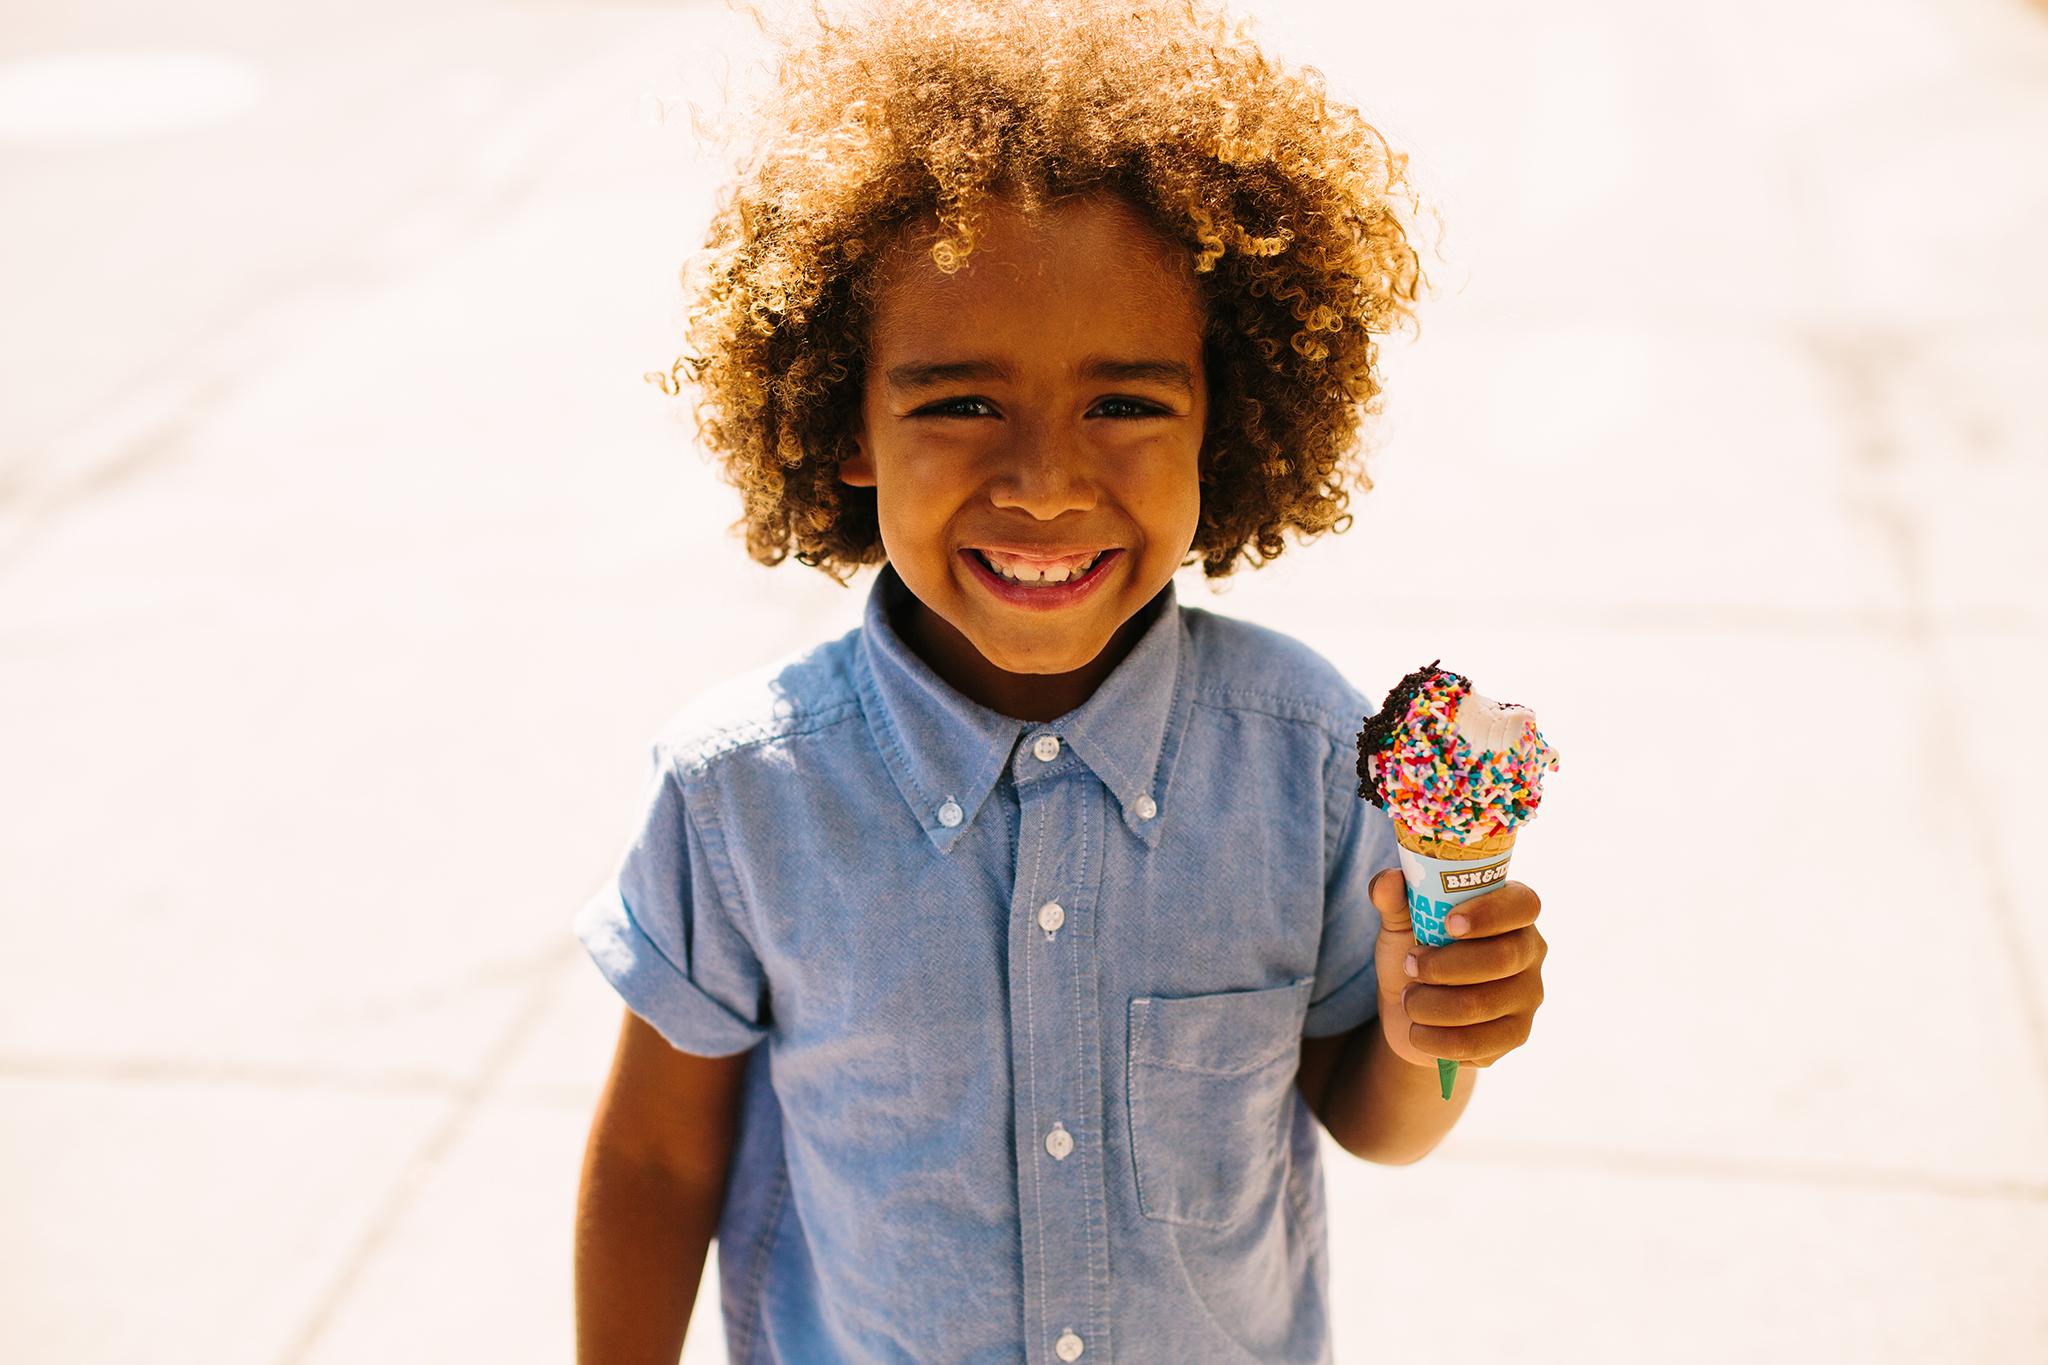 little boy ben and jerrys ice cream smile web.jpg